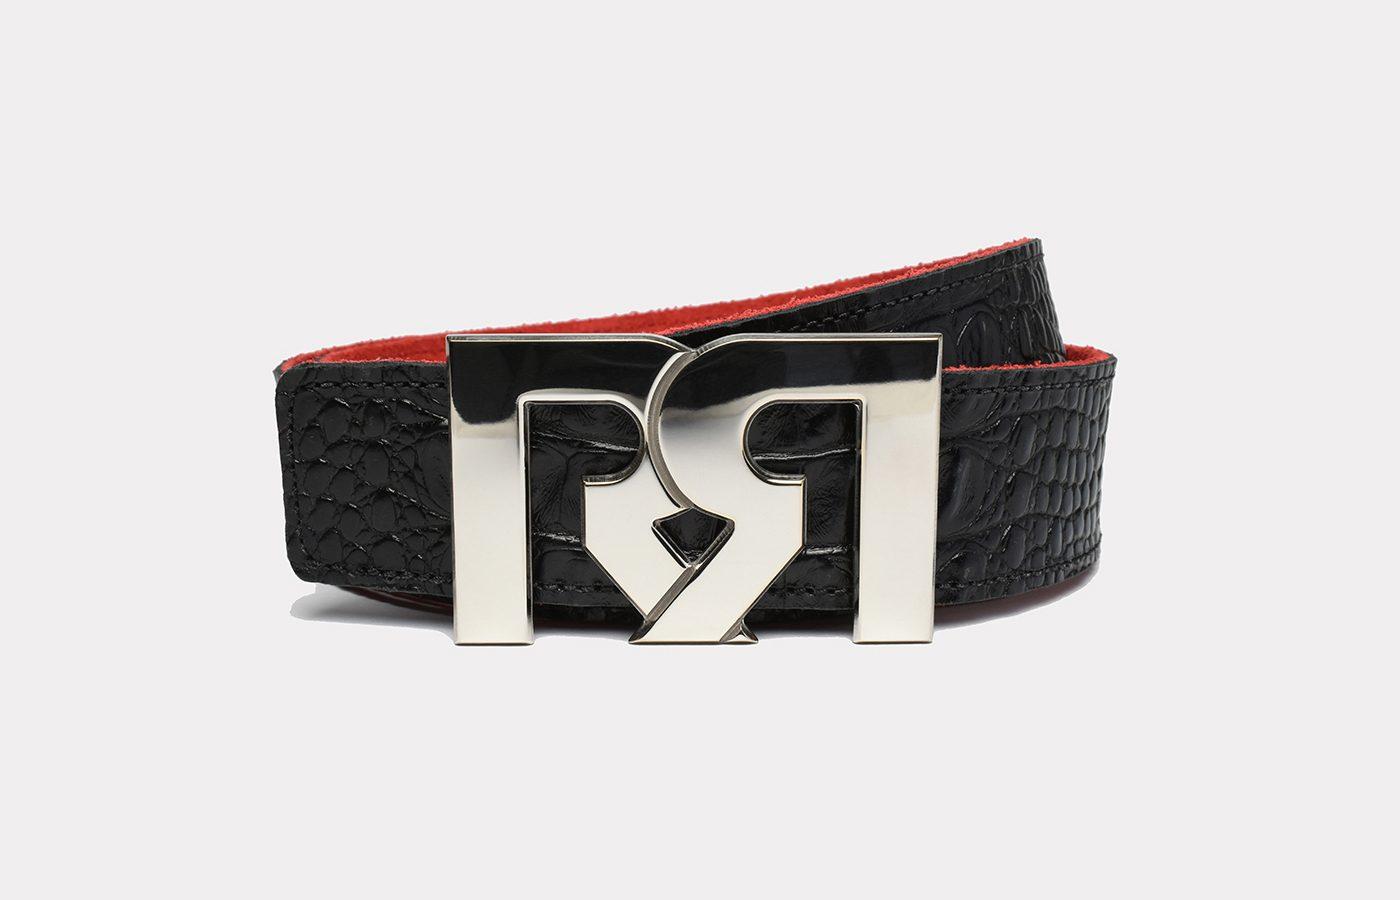 RR Designer belts Polished Palladium plated with Croc Embossed Leather strap